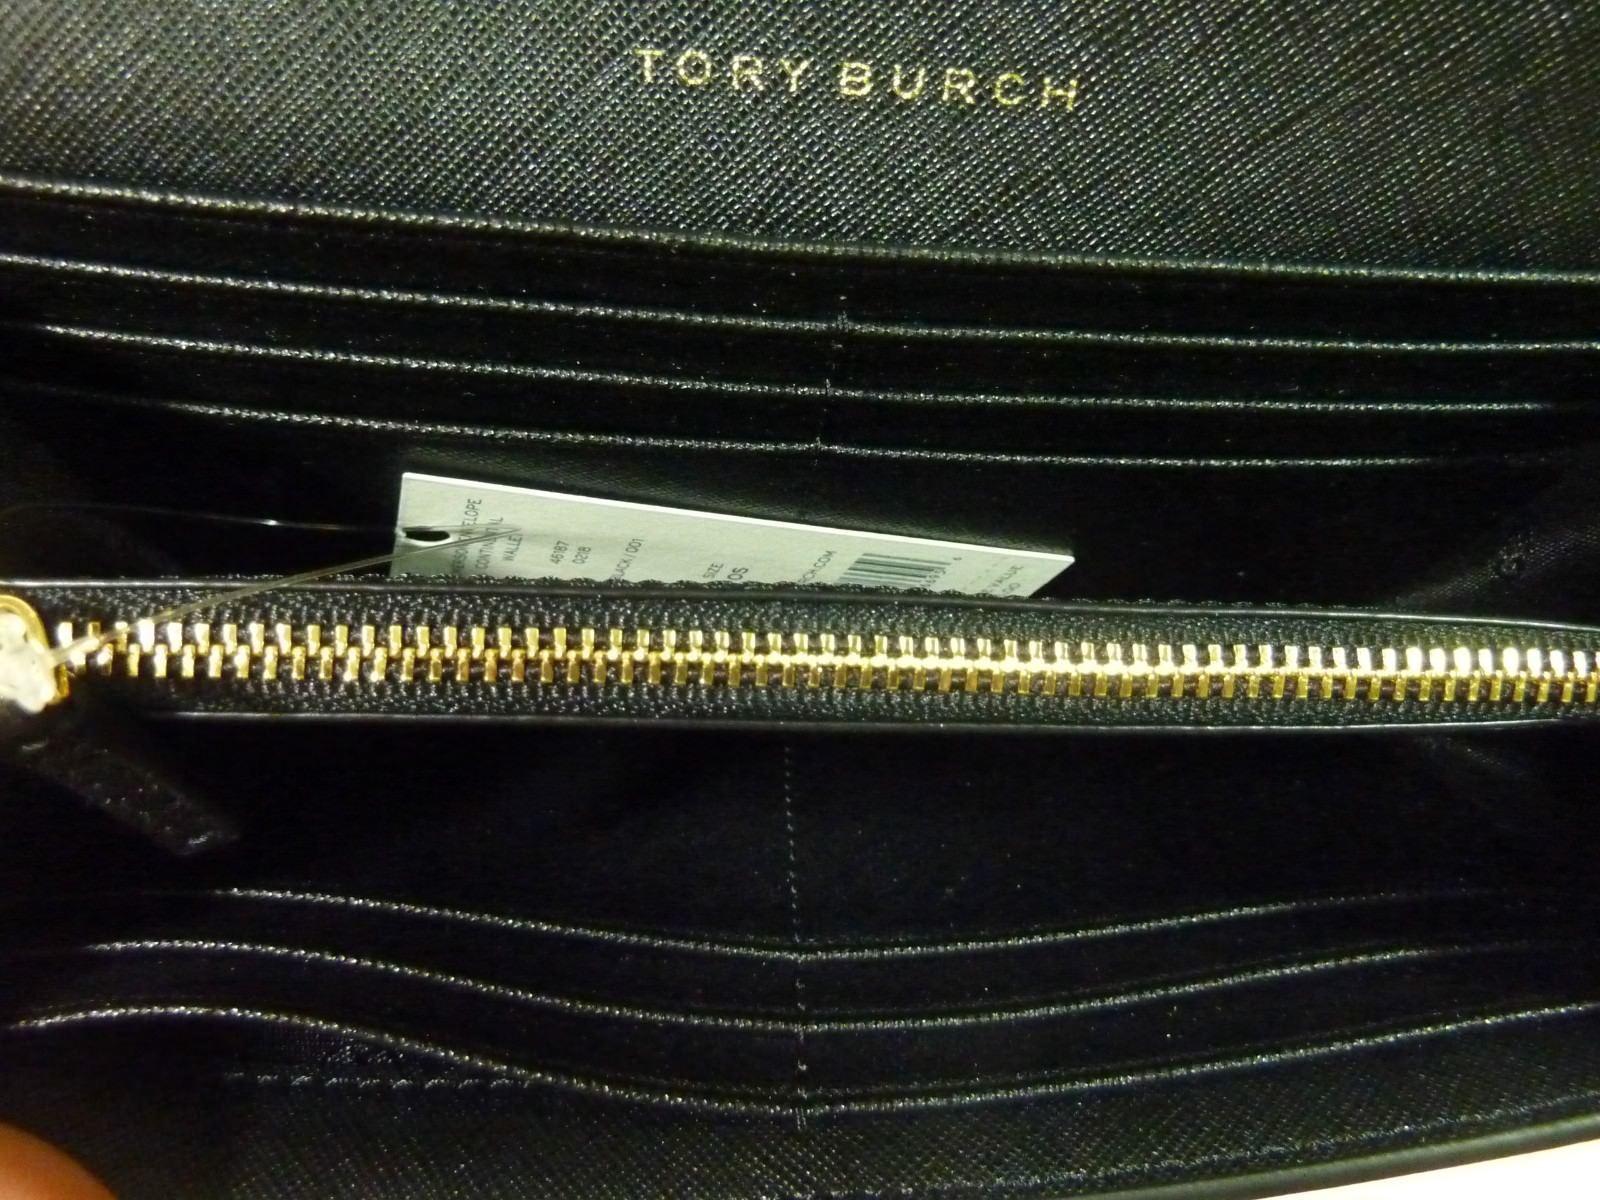 NWT Tory Burch Classic Black Saffiano Robinson Middy Satchel + Wallet $800 image 12